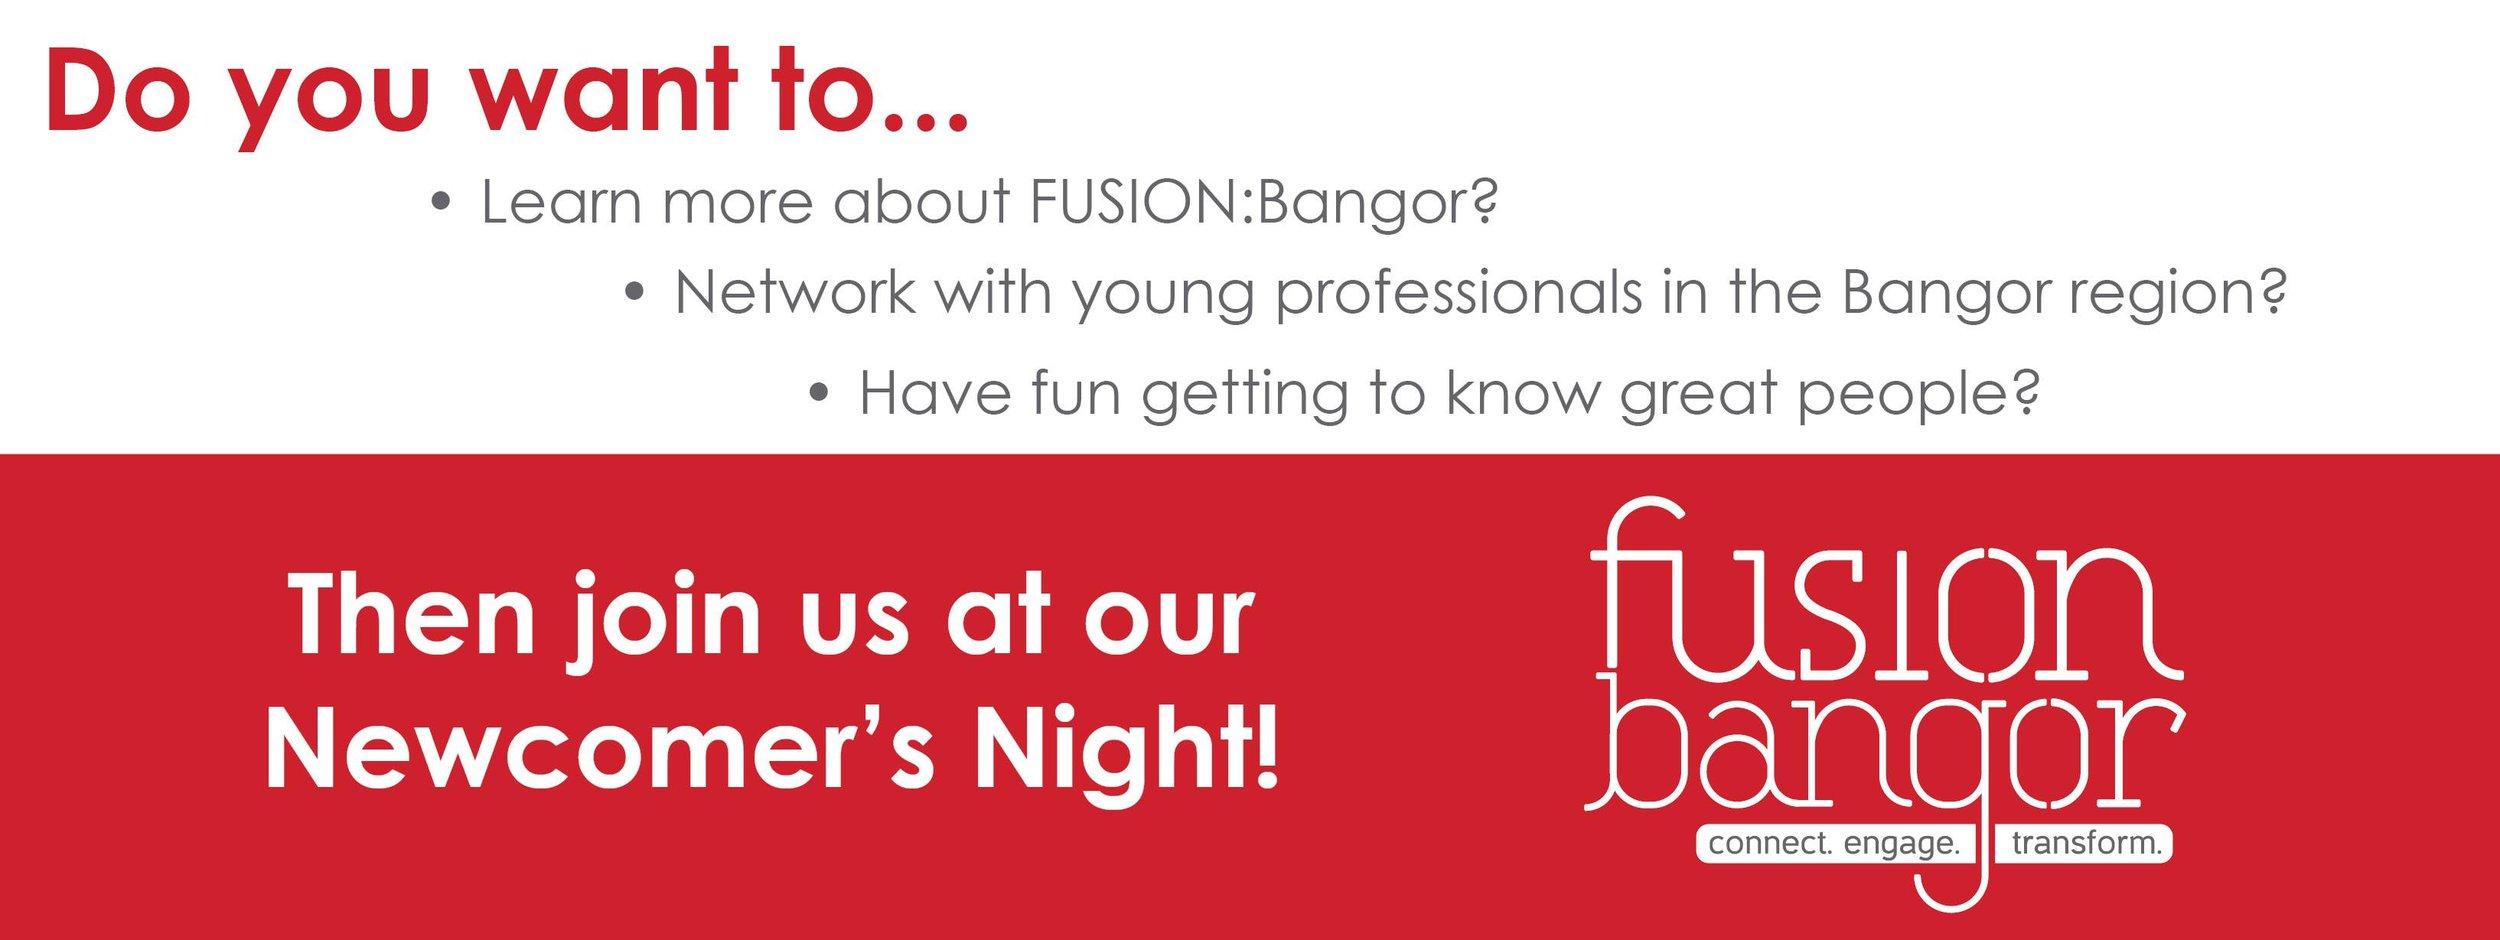 Newcomers Night - Fusion Bangor